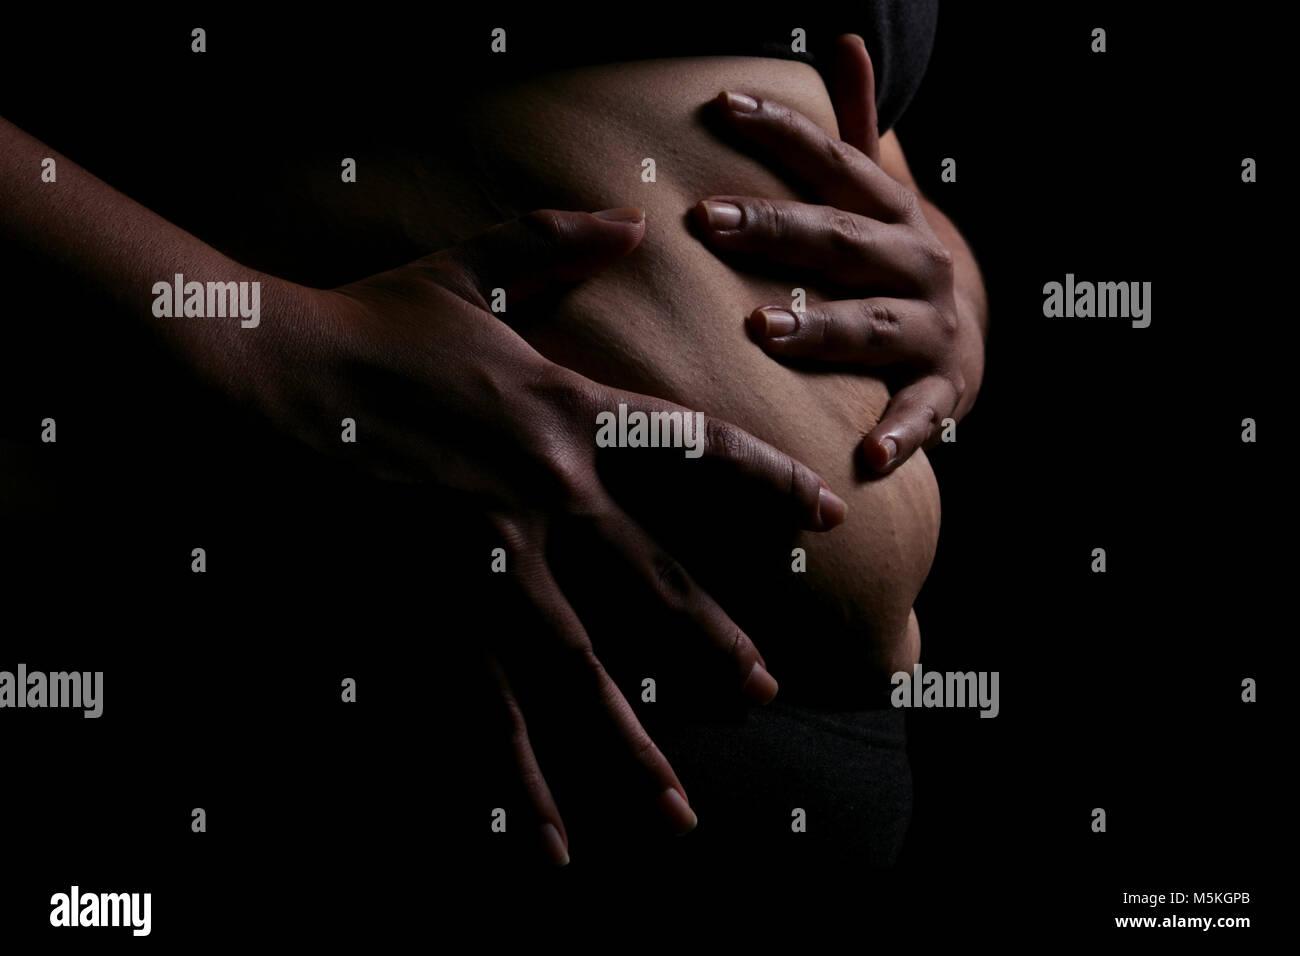 Studio shot to illustrate OBESITY PREVENTION  Model:  Farrah Olieri   Model Release/Consent Form on File - Stock Image